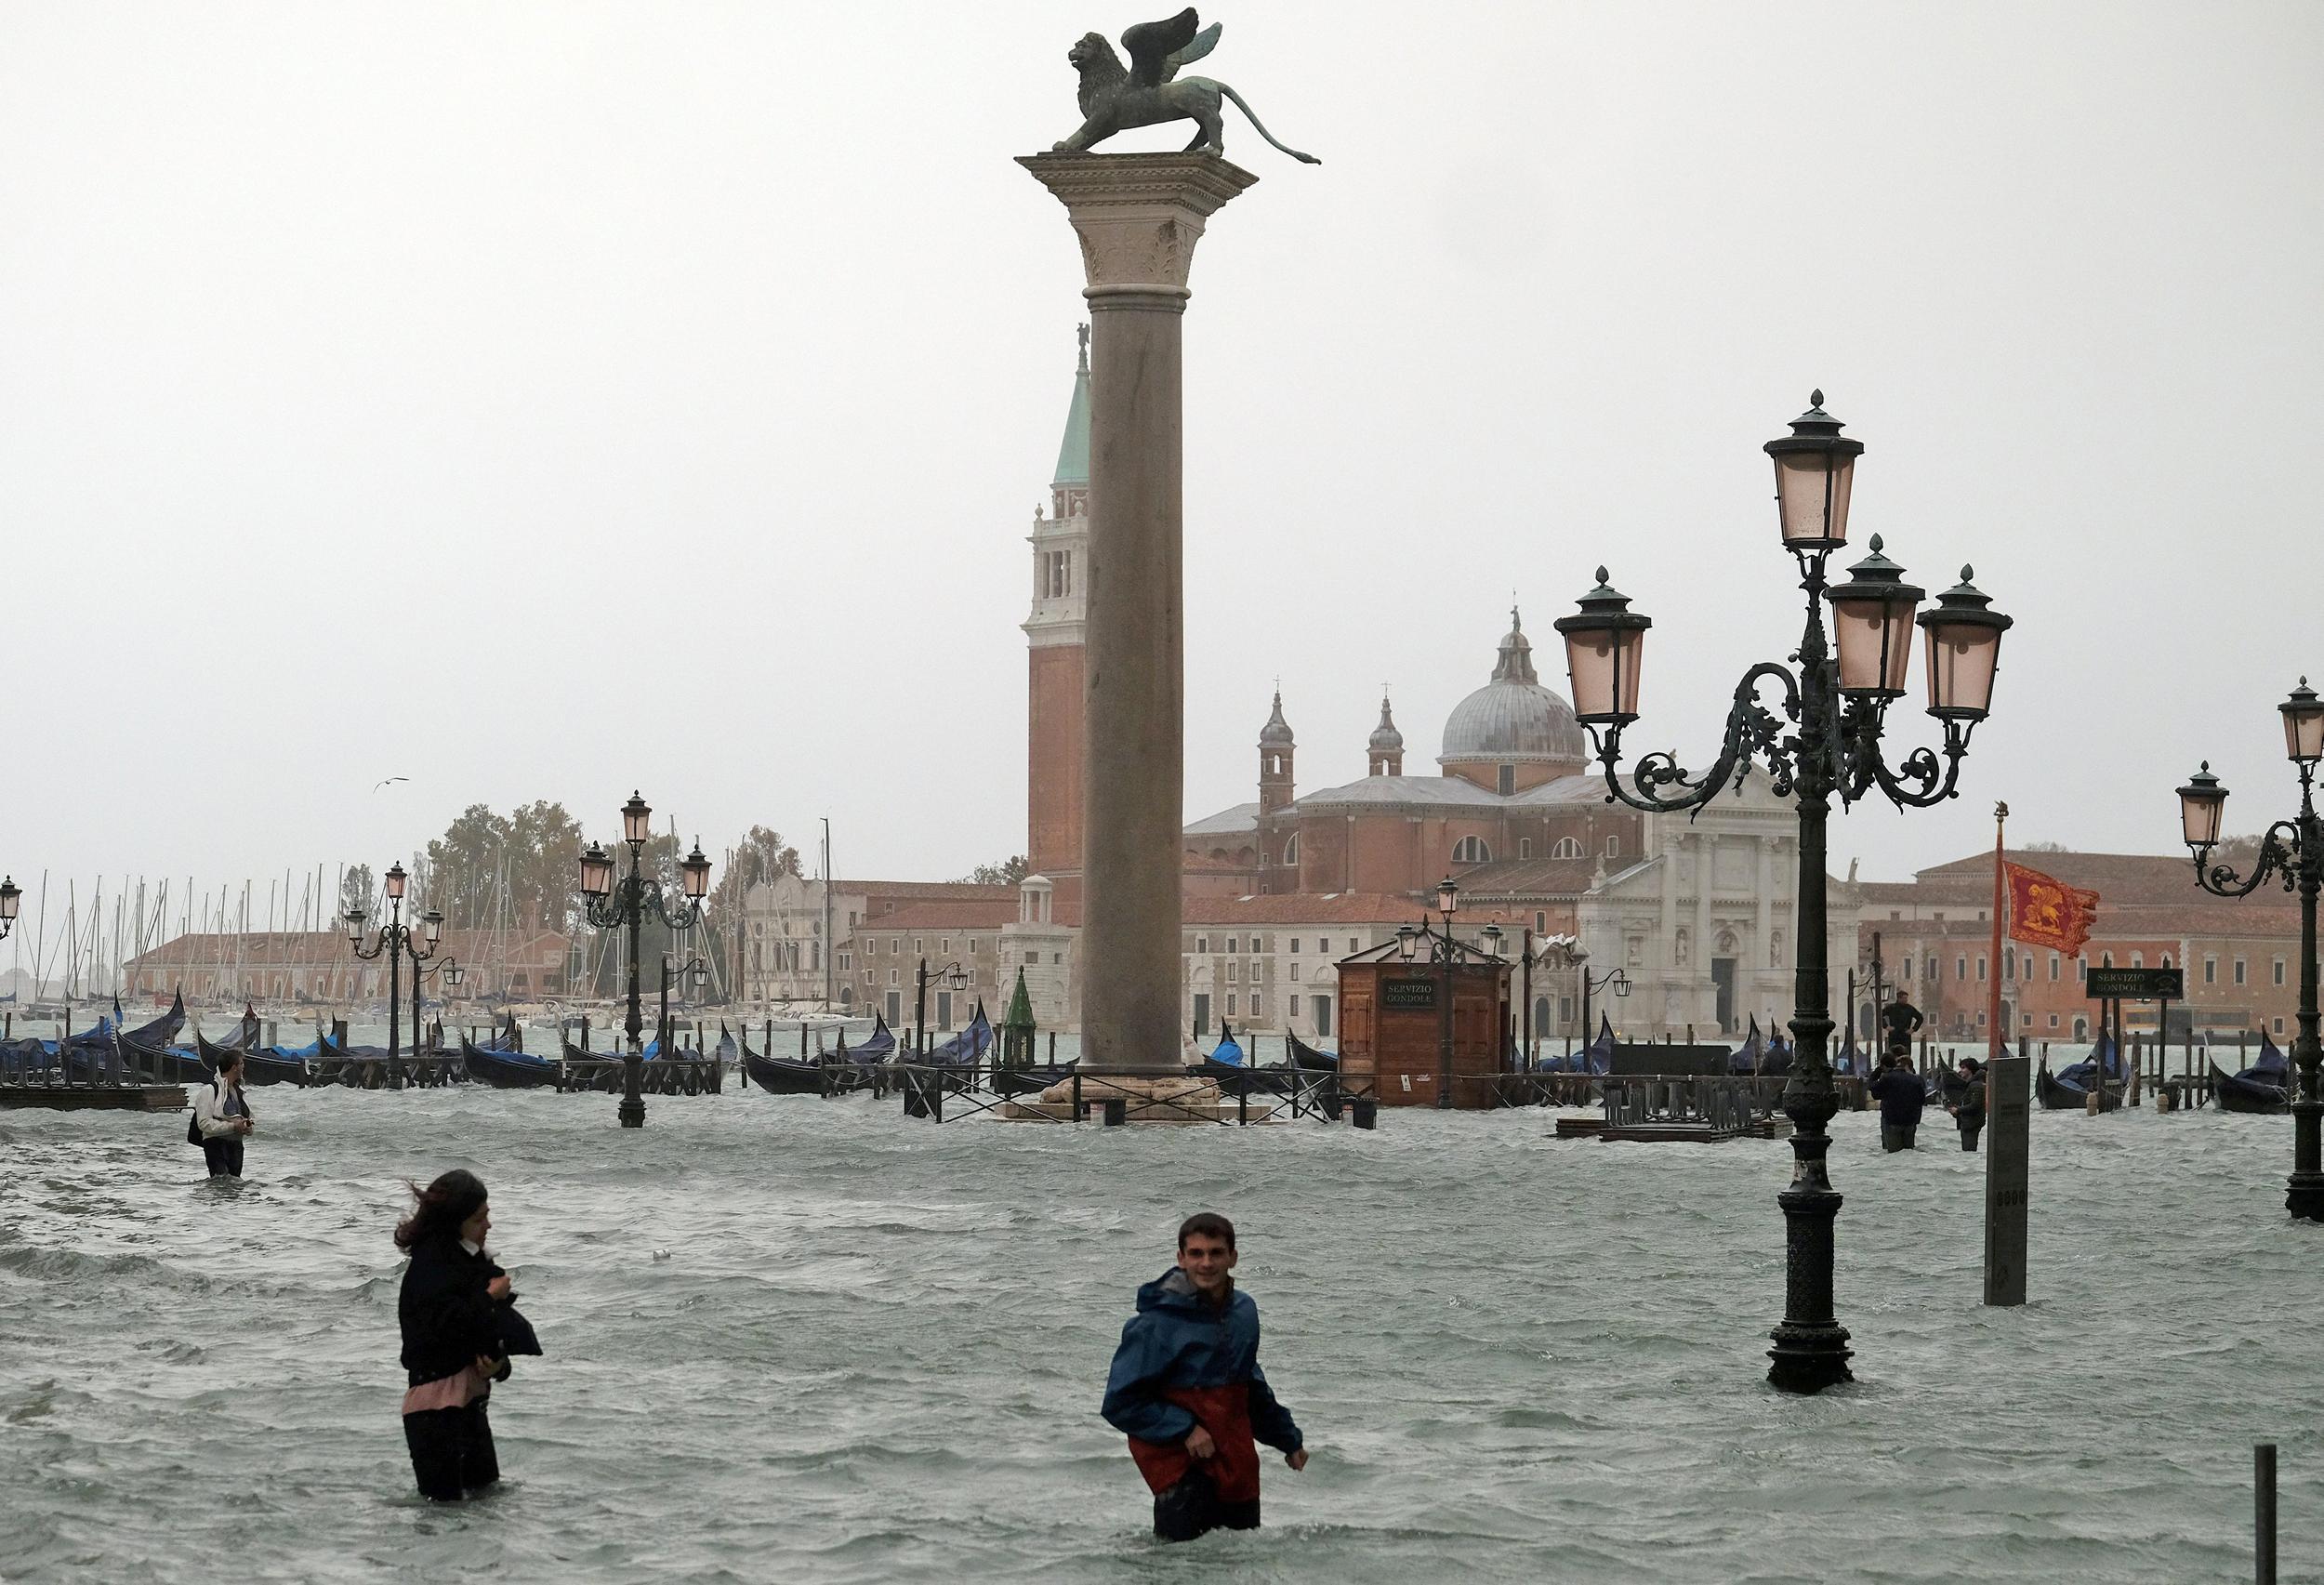 https://media4.s-nbcnews.com/i/newscms/2018_44/2624101/181030-venice-floods-ew-1036a_6650d61ddc57af74fe5cfab22fa6d7fb.jpg